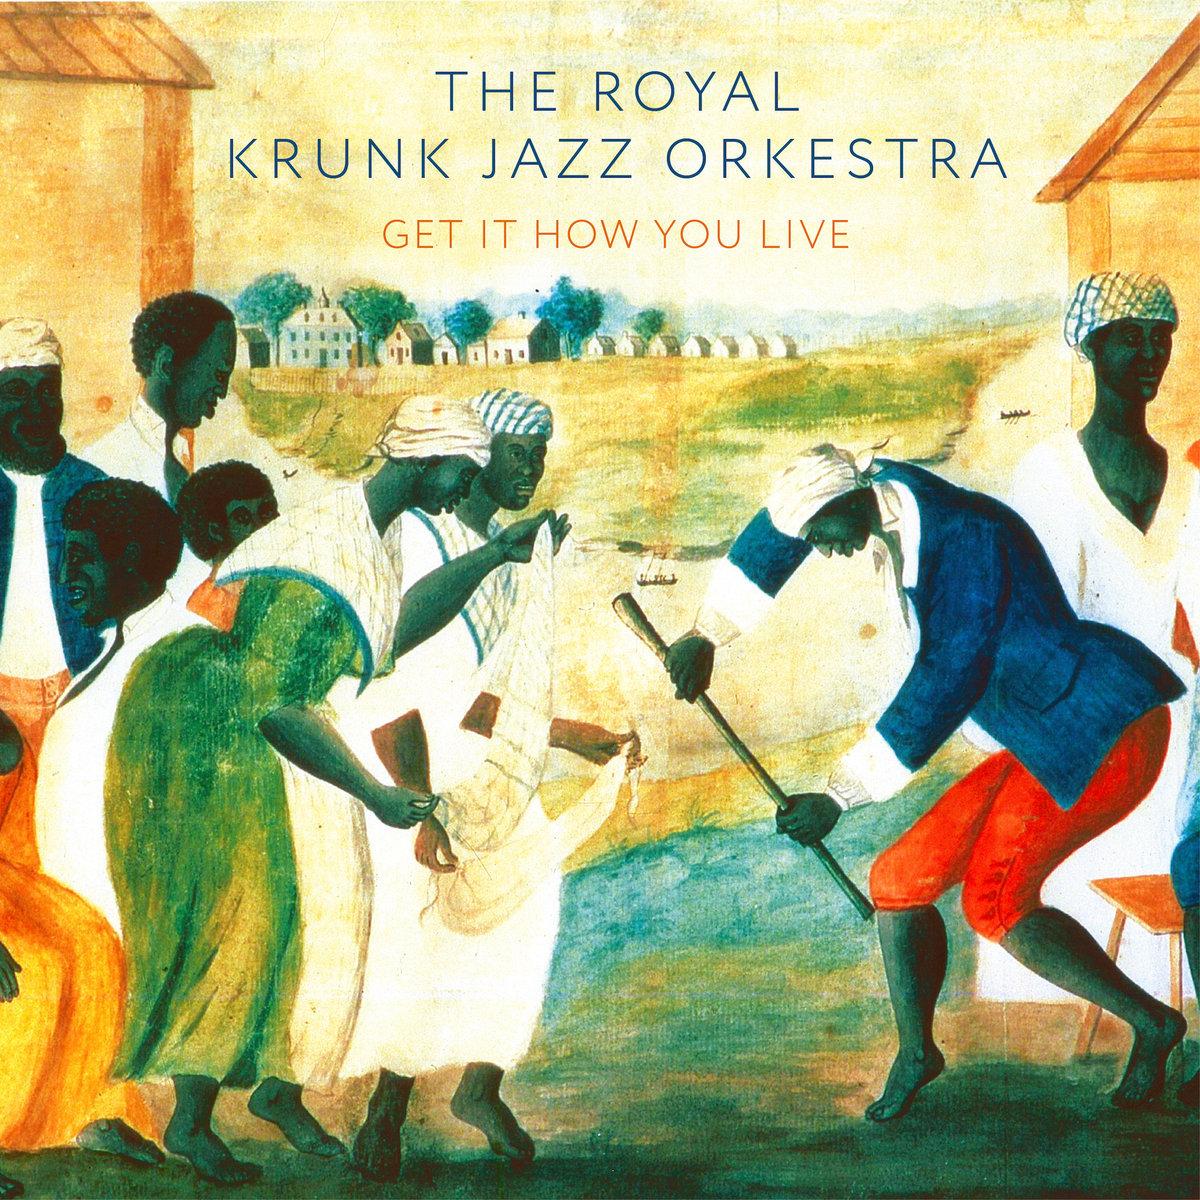 Lyne's Joint | The Royal Krunk Jazz Orkestra